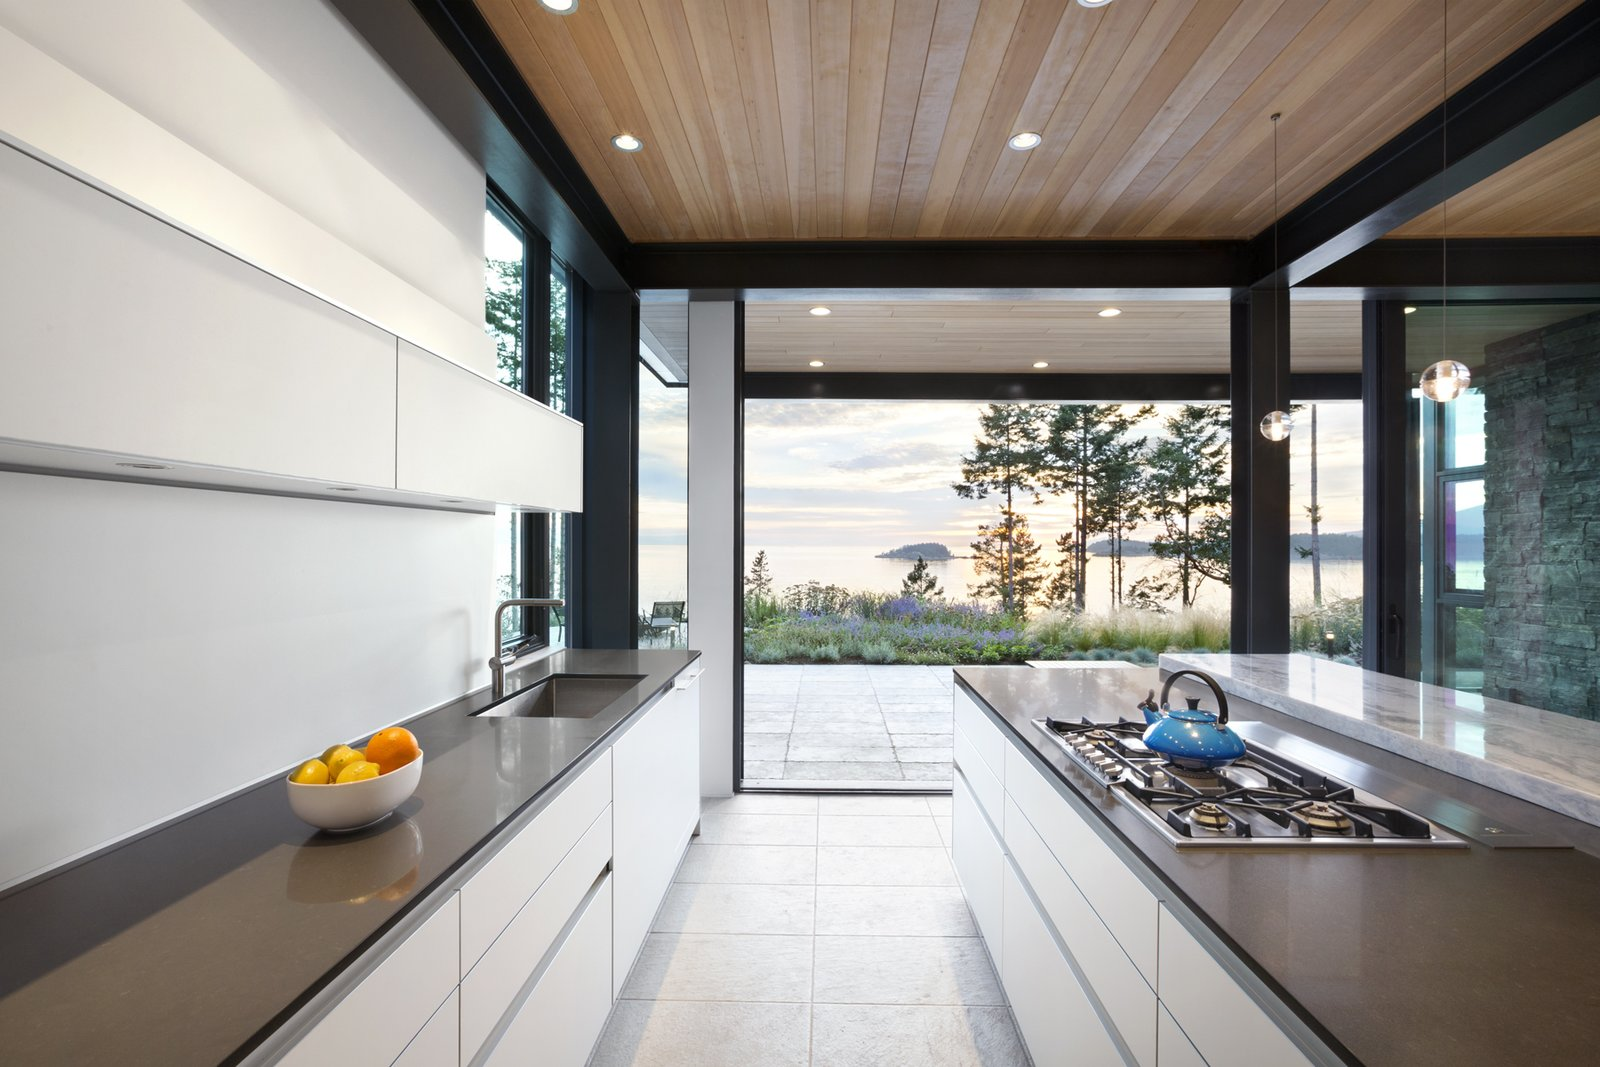 Kitchen, Engineered Quartz, Pendant, Refrigerator, White, Range, Ceiling, Wall Oven, Porcelain Tile, Dishwasher, and Undermount  Kitchen Undermount Wall Oven Porcelain Tile Photos from Collingwood Residence